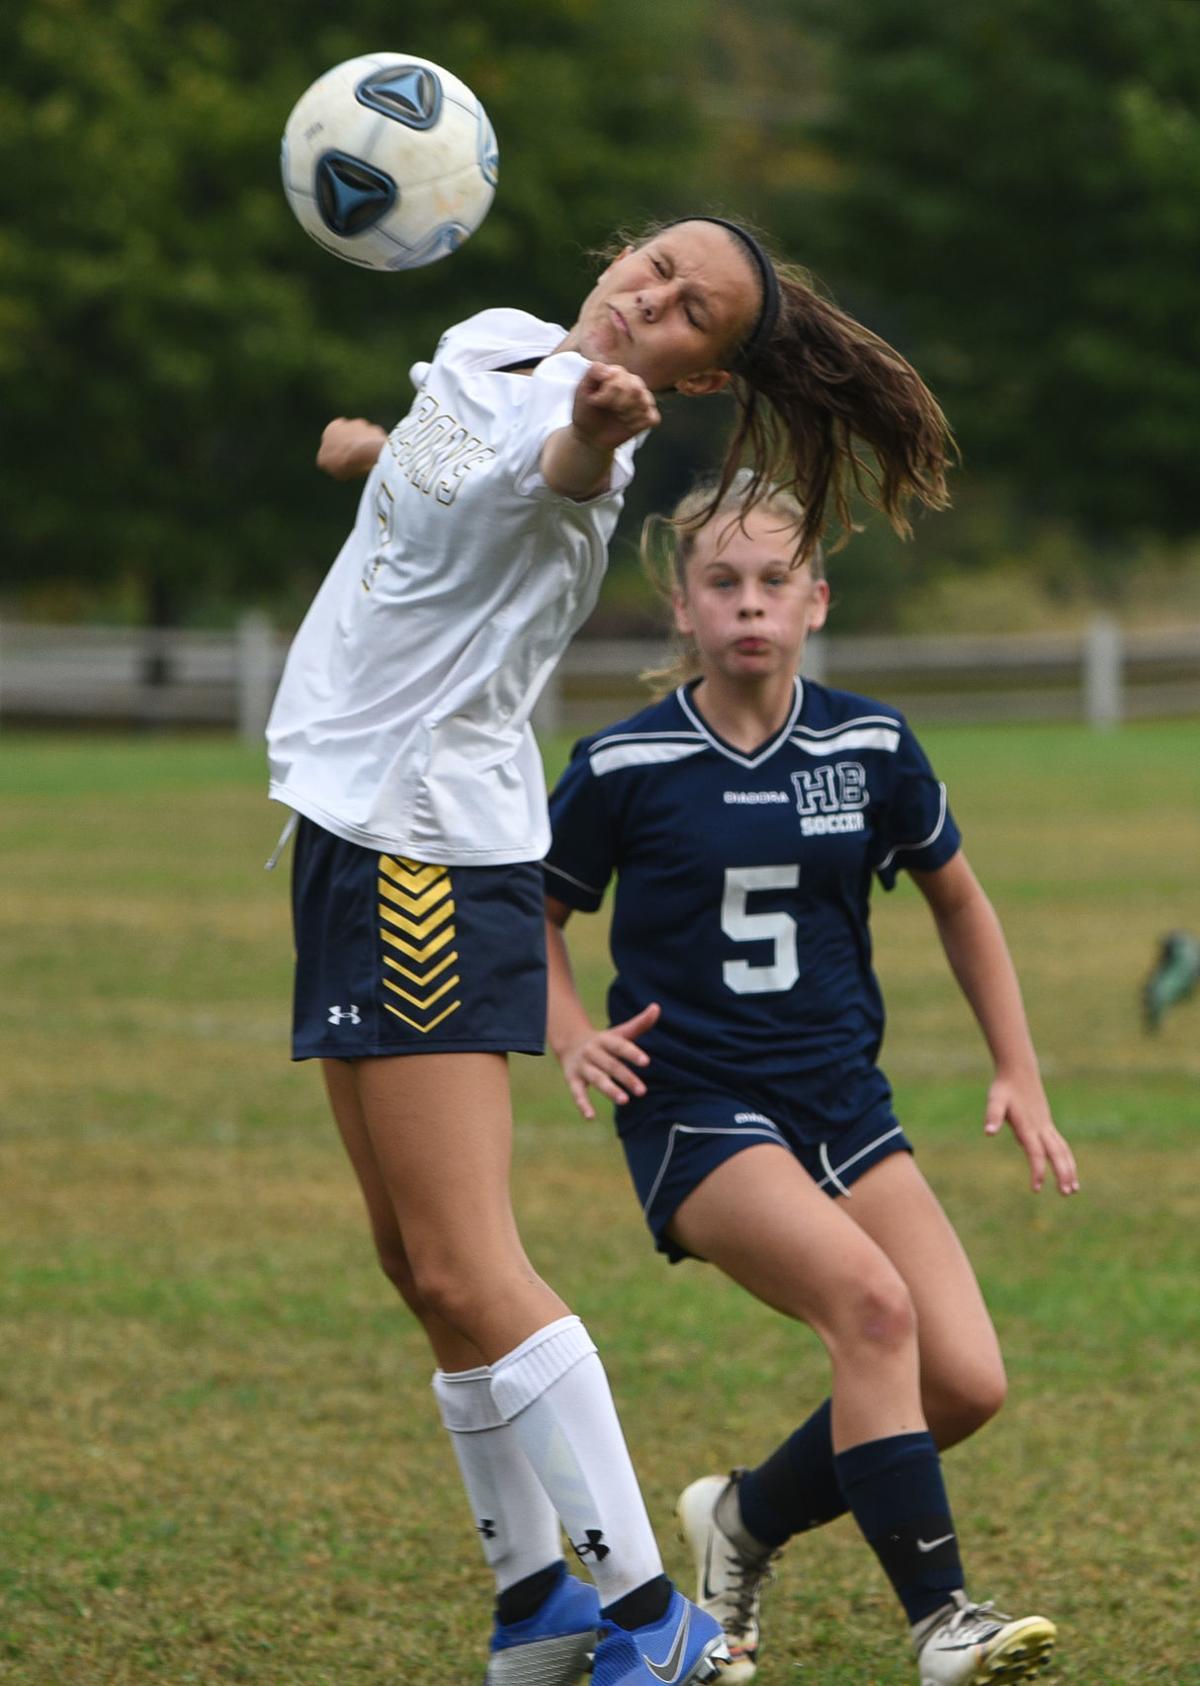 Bow-Hollis girls' soccer